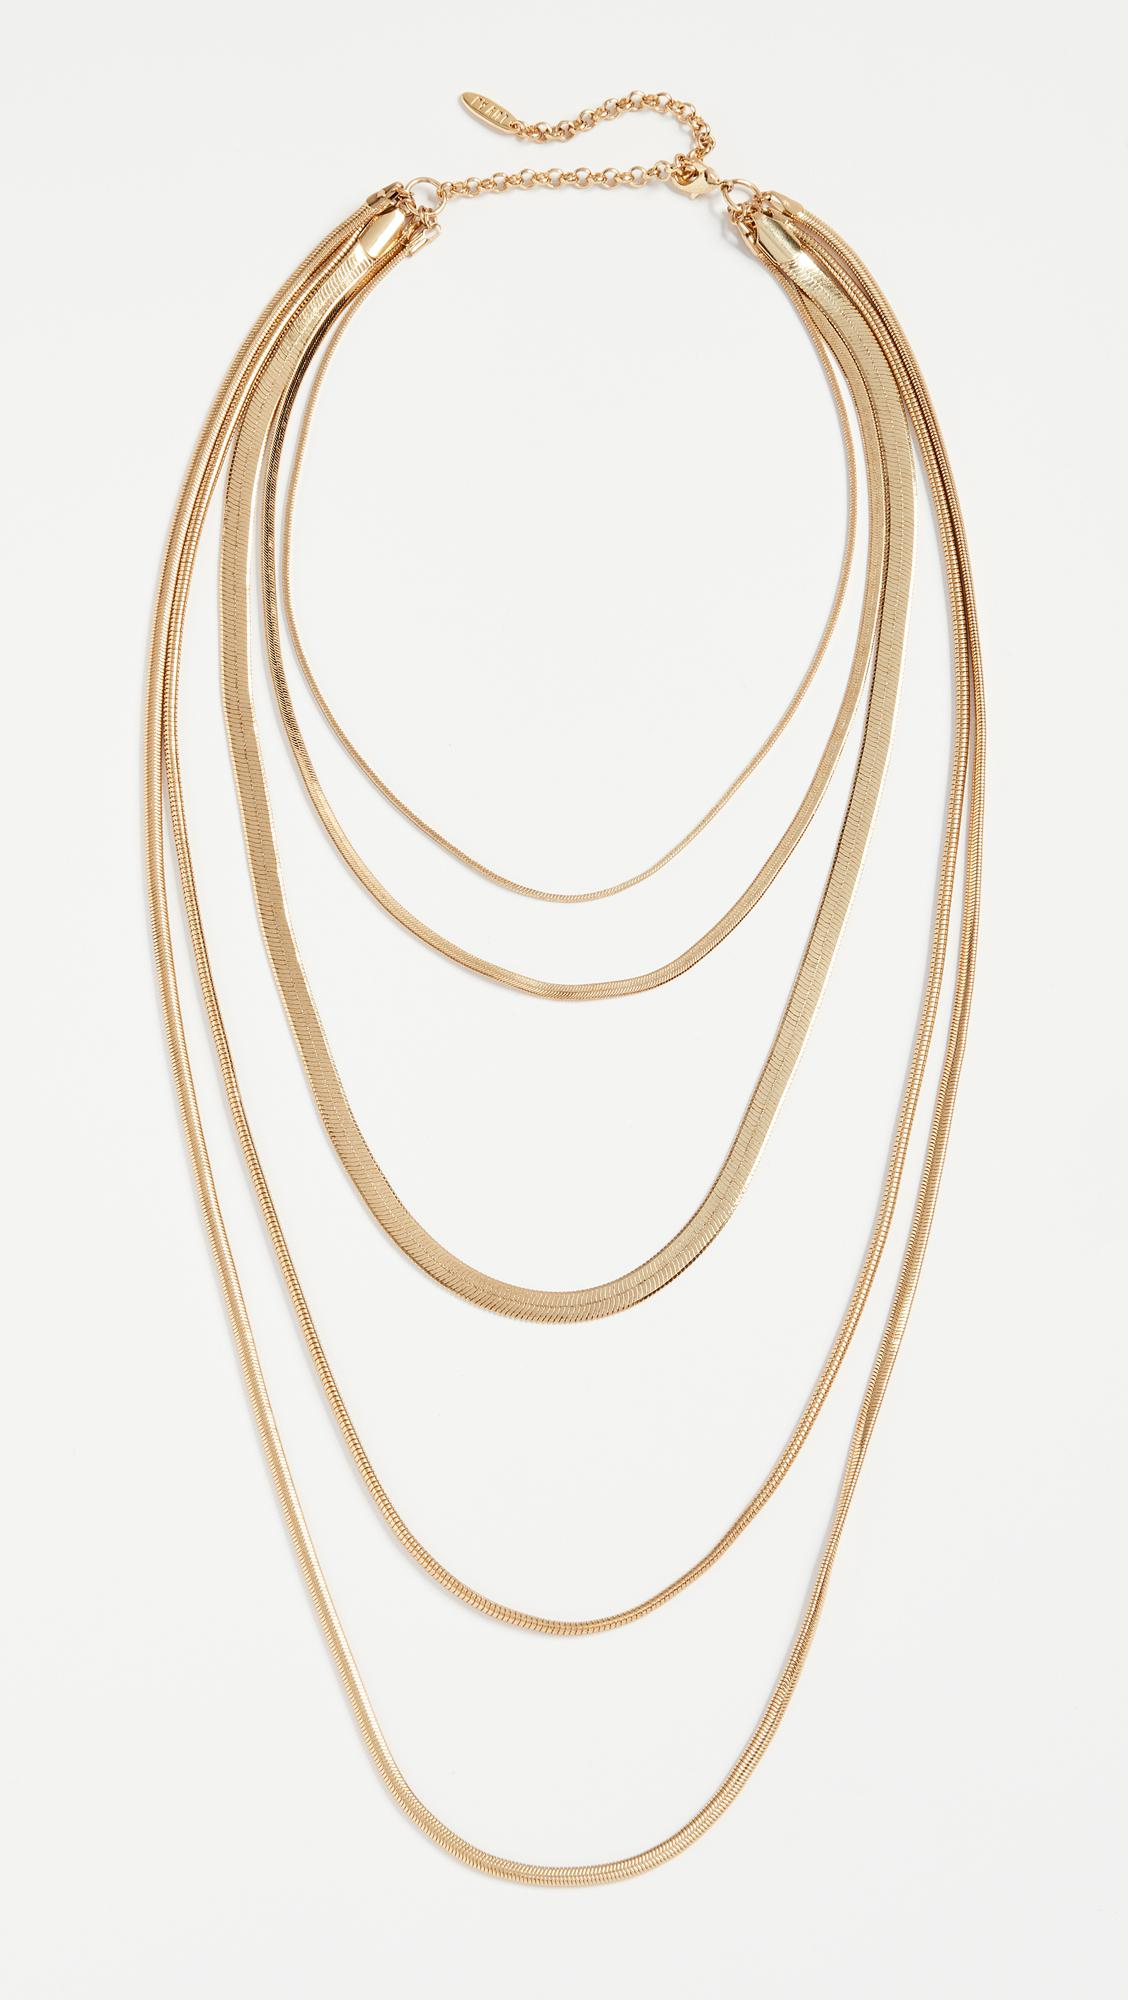 Luv AJ The Cascading Snake Chain Necklace 7mOinMeKLr